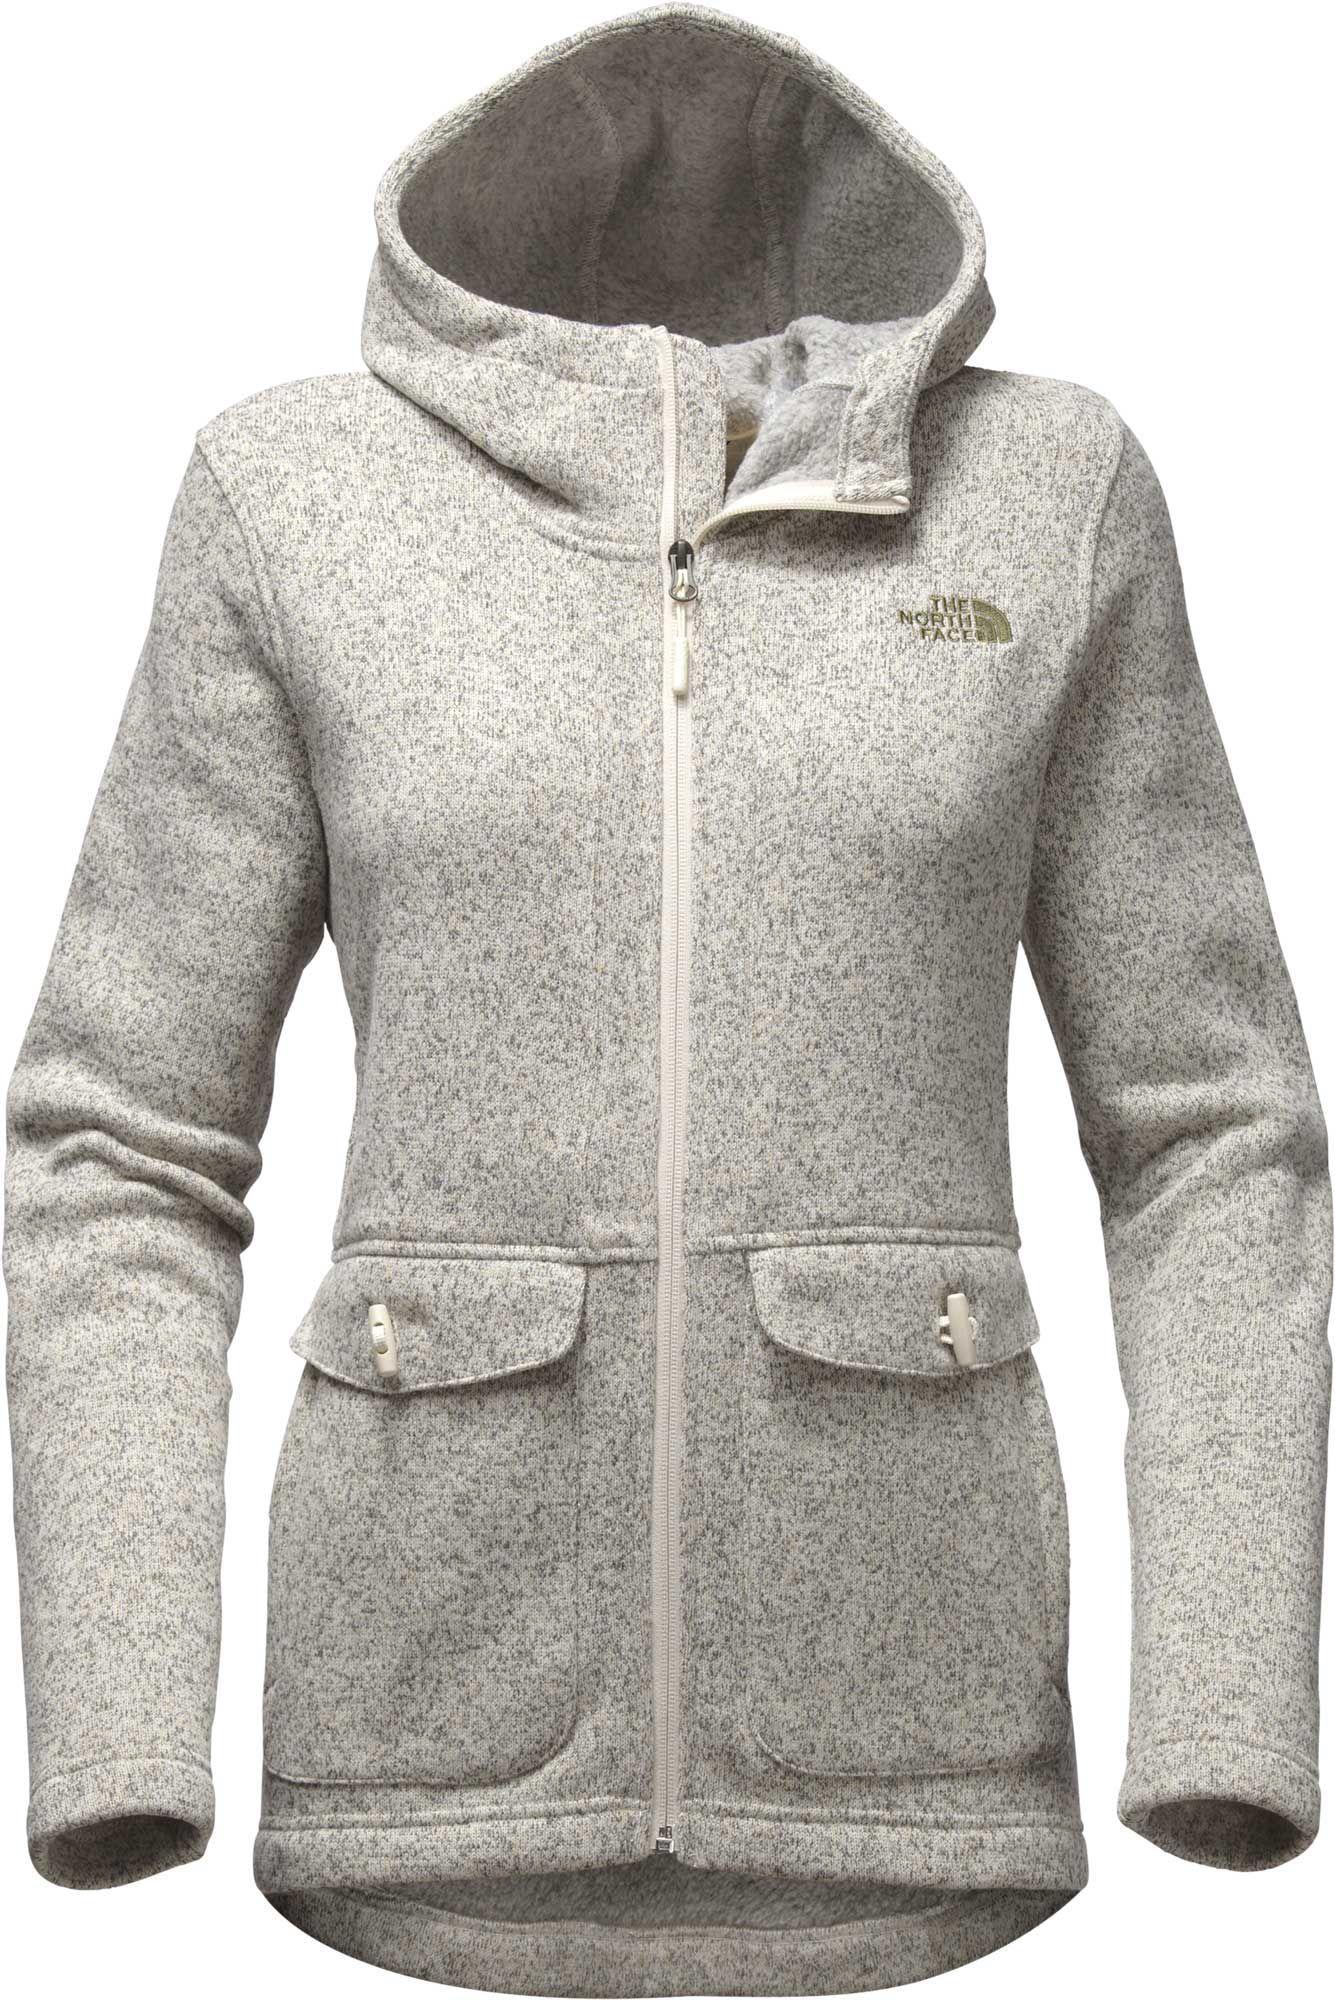 The North Face Women s Crescent Parka Sweater Fleece Jacket 6ce0c857a